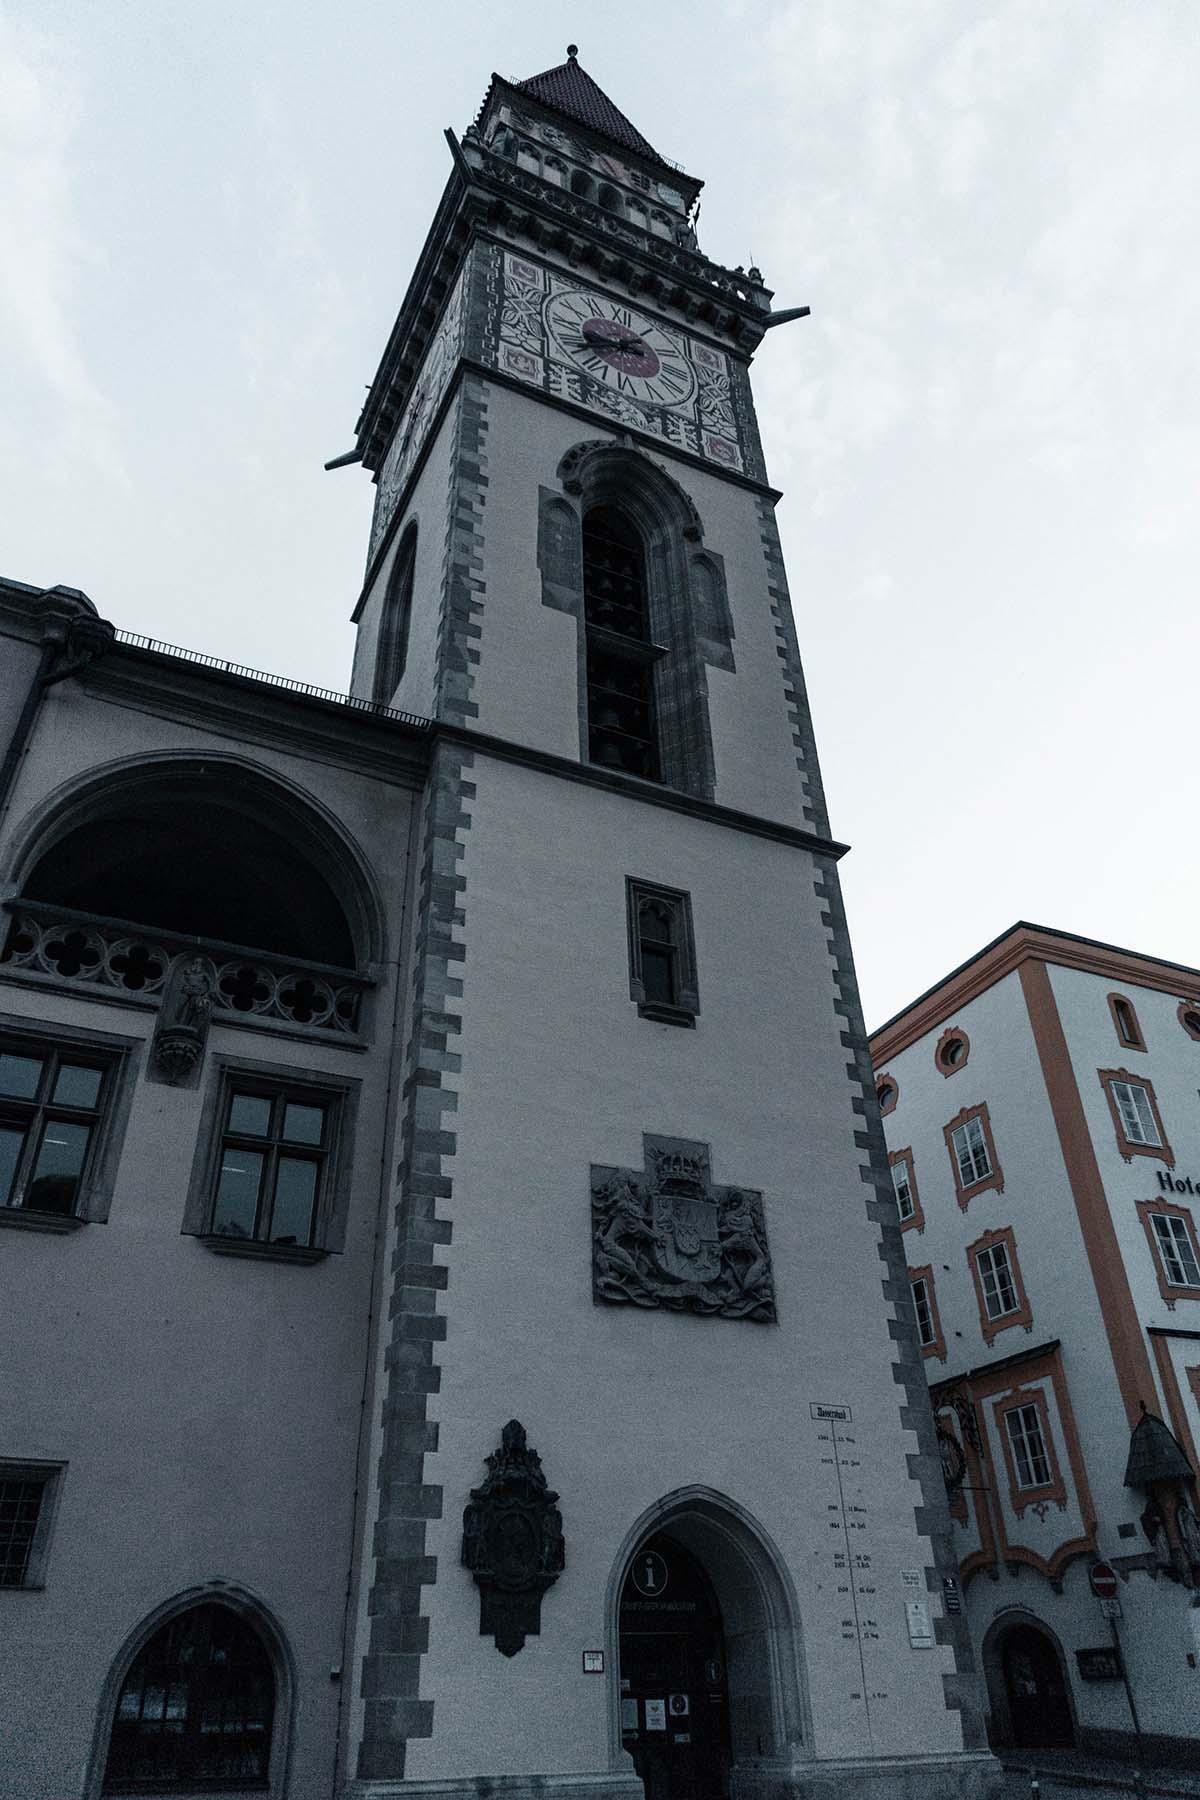 passau-altstadt-rathaus-02